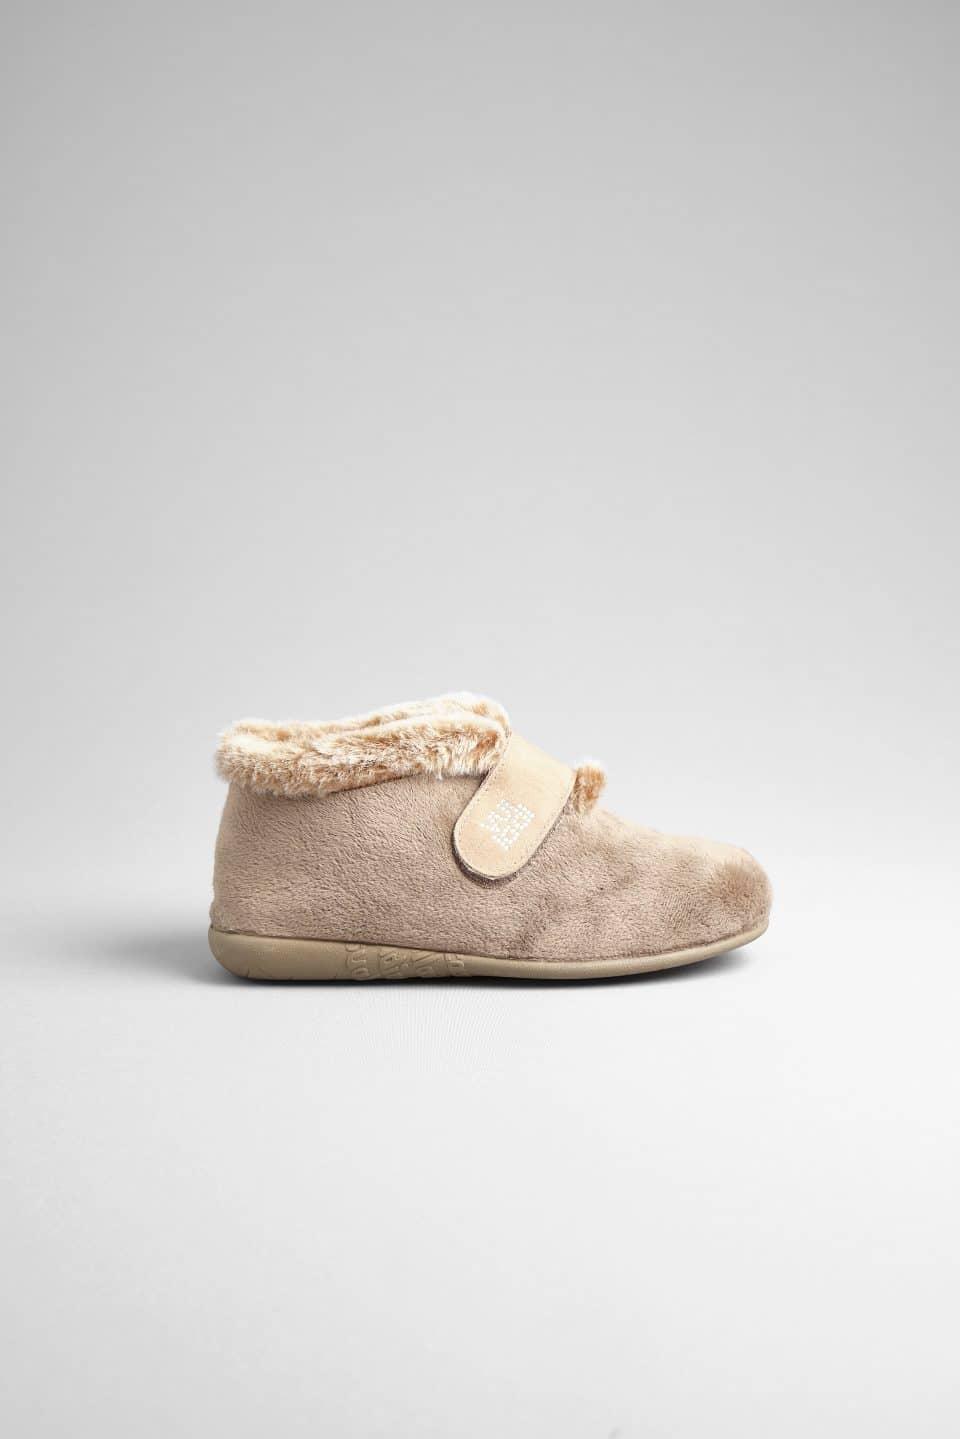 BOTIN ALASKA TAUPE Marcas en Loyna Shoes